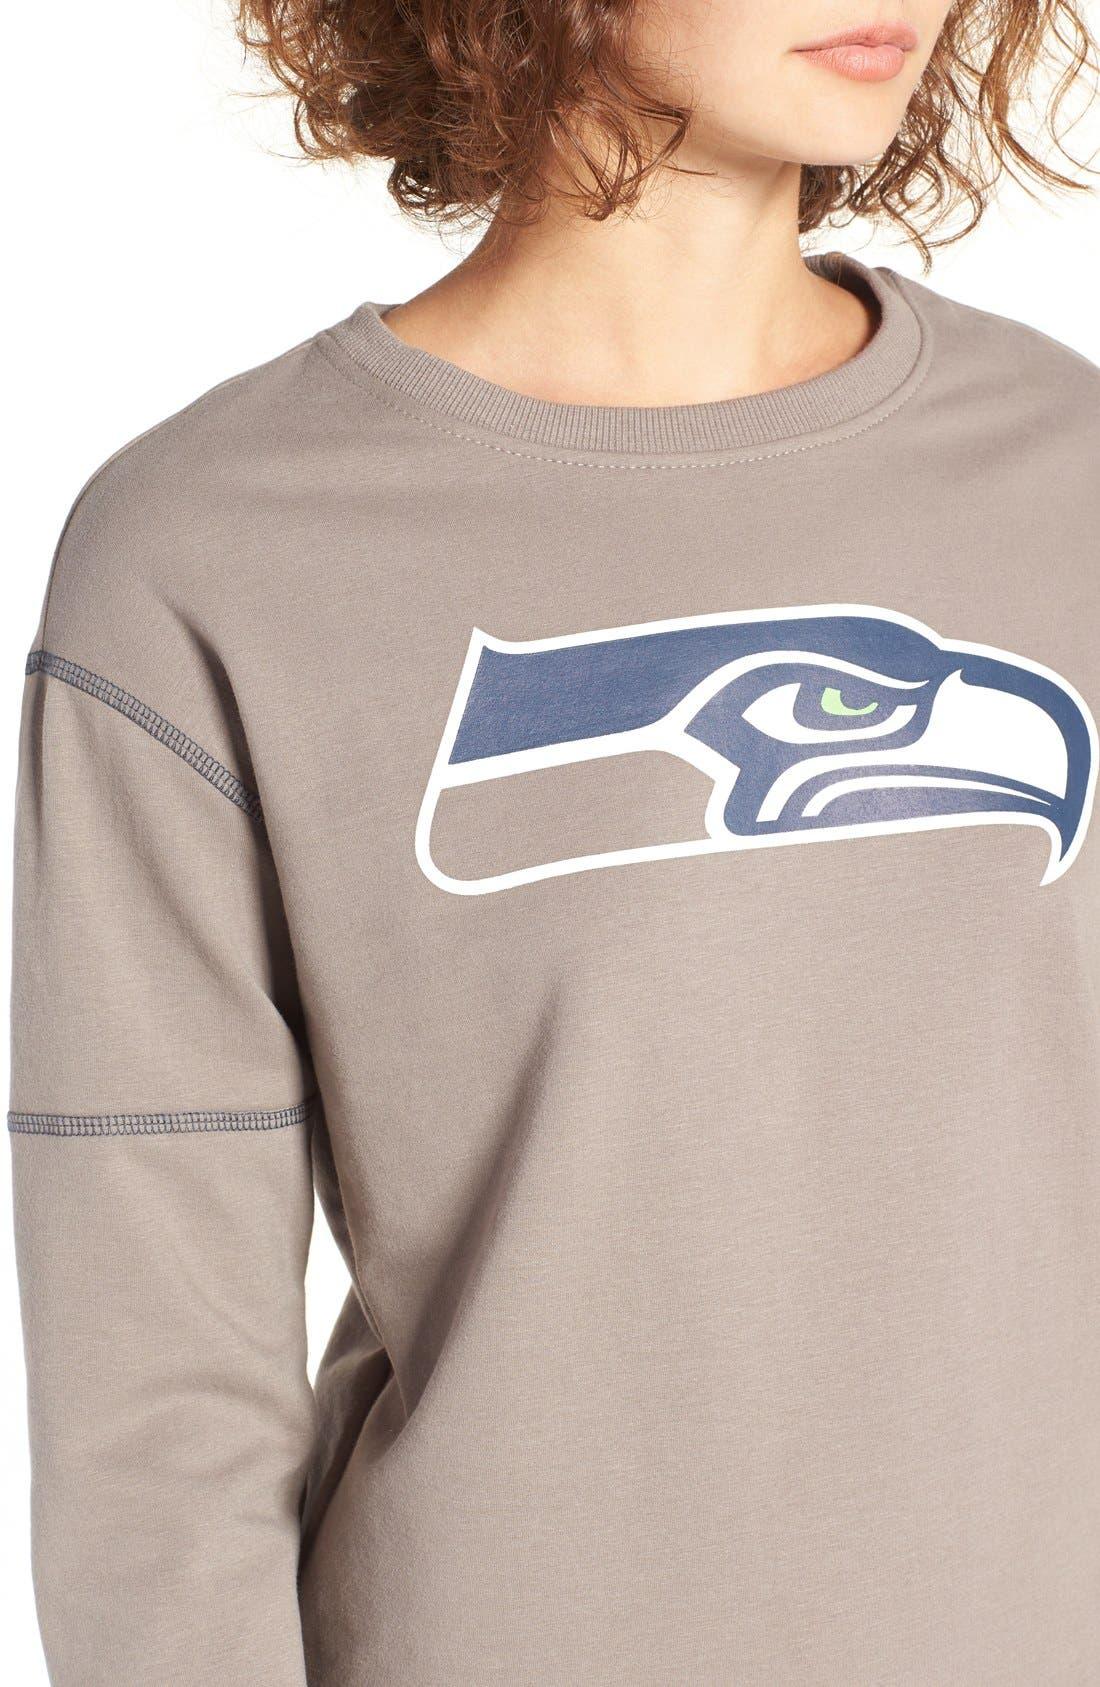 Alternate Image 4  - 47 Brand 'Seattle Seahawks' Graphic Sweatshirt